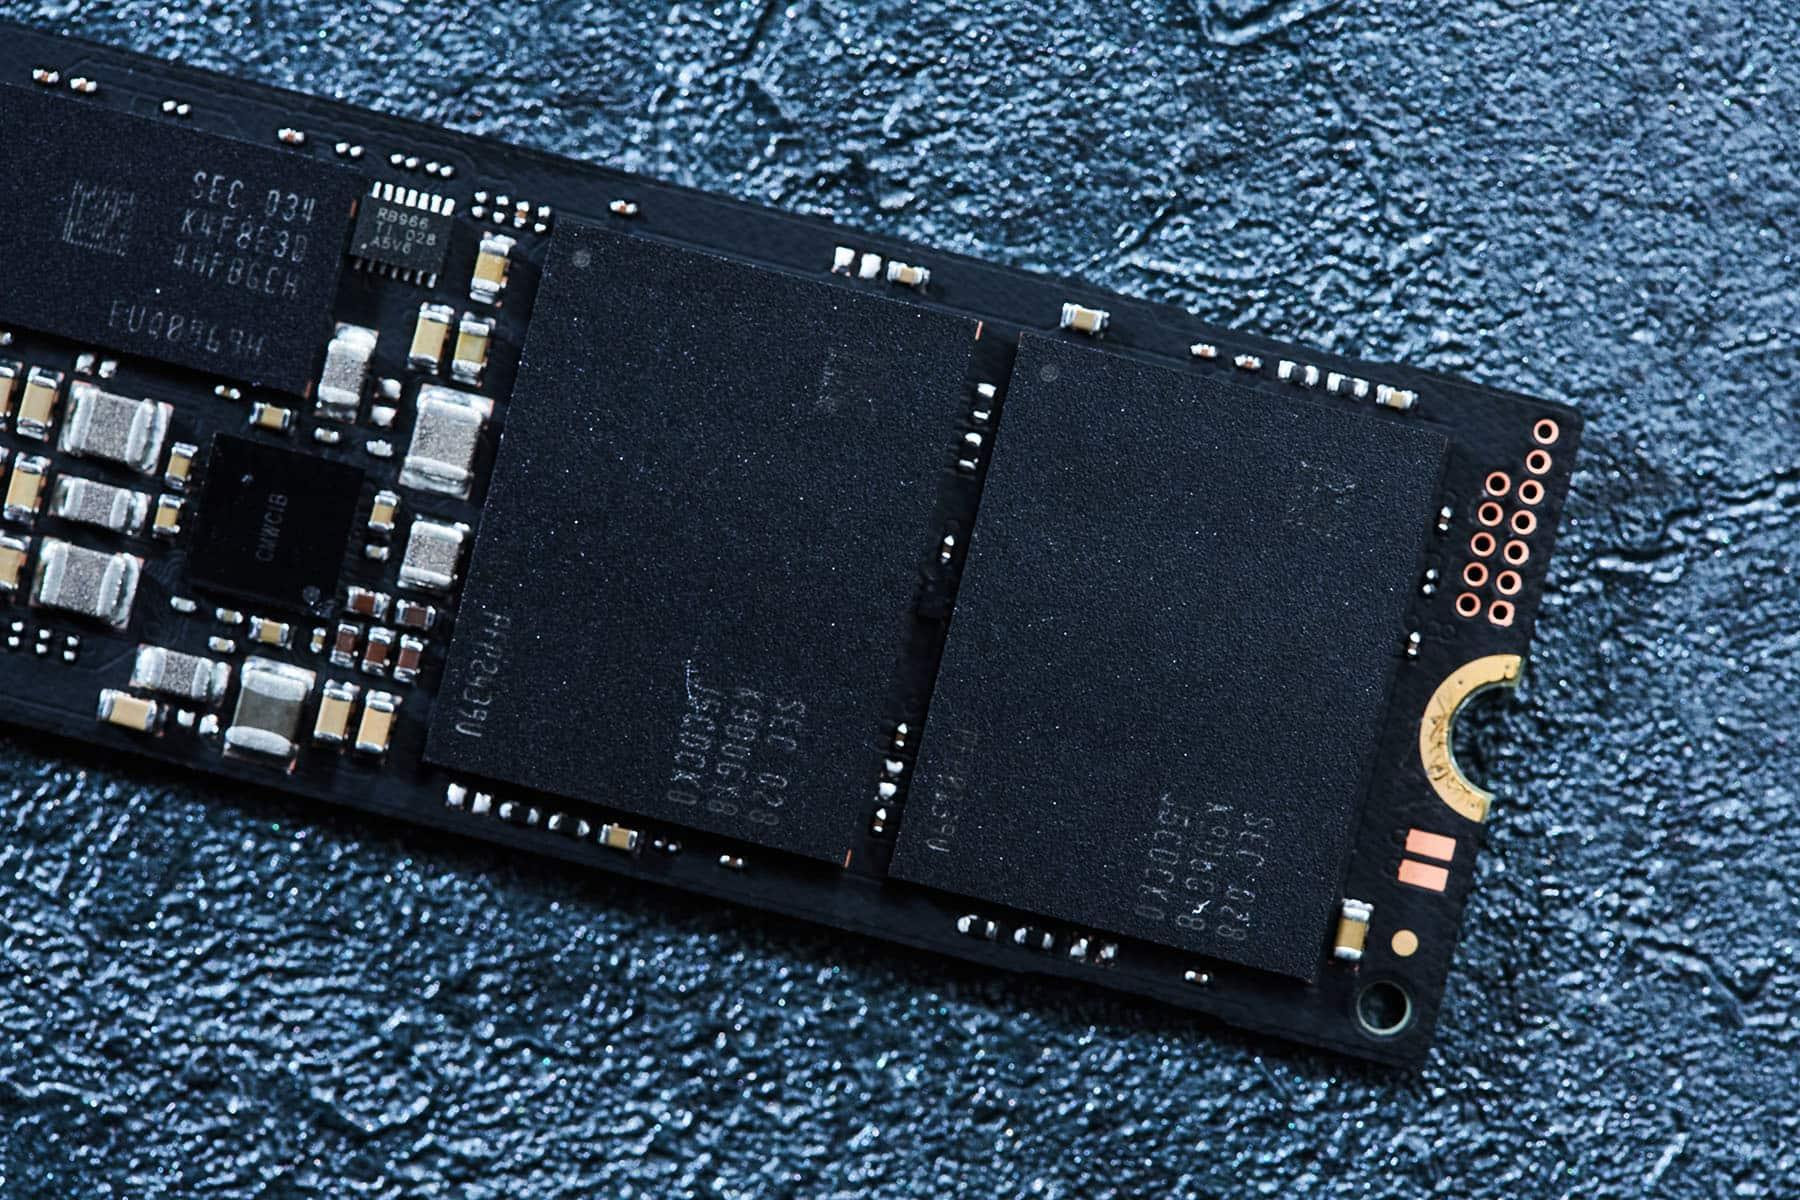 Samsung 980 PRO 搭載三星 V-NAND 技術的快閃記憶體晶片,此次受測的規格為 1TB 版本,因此單一封裝晶片的容量為 512 GB。